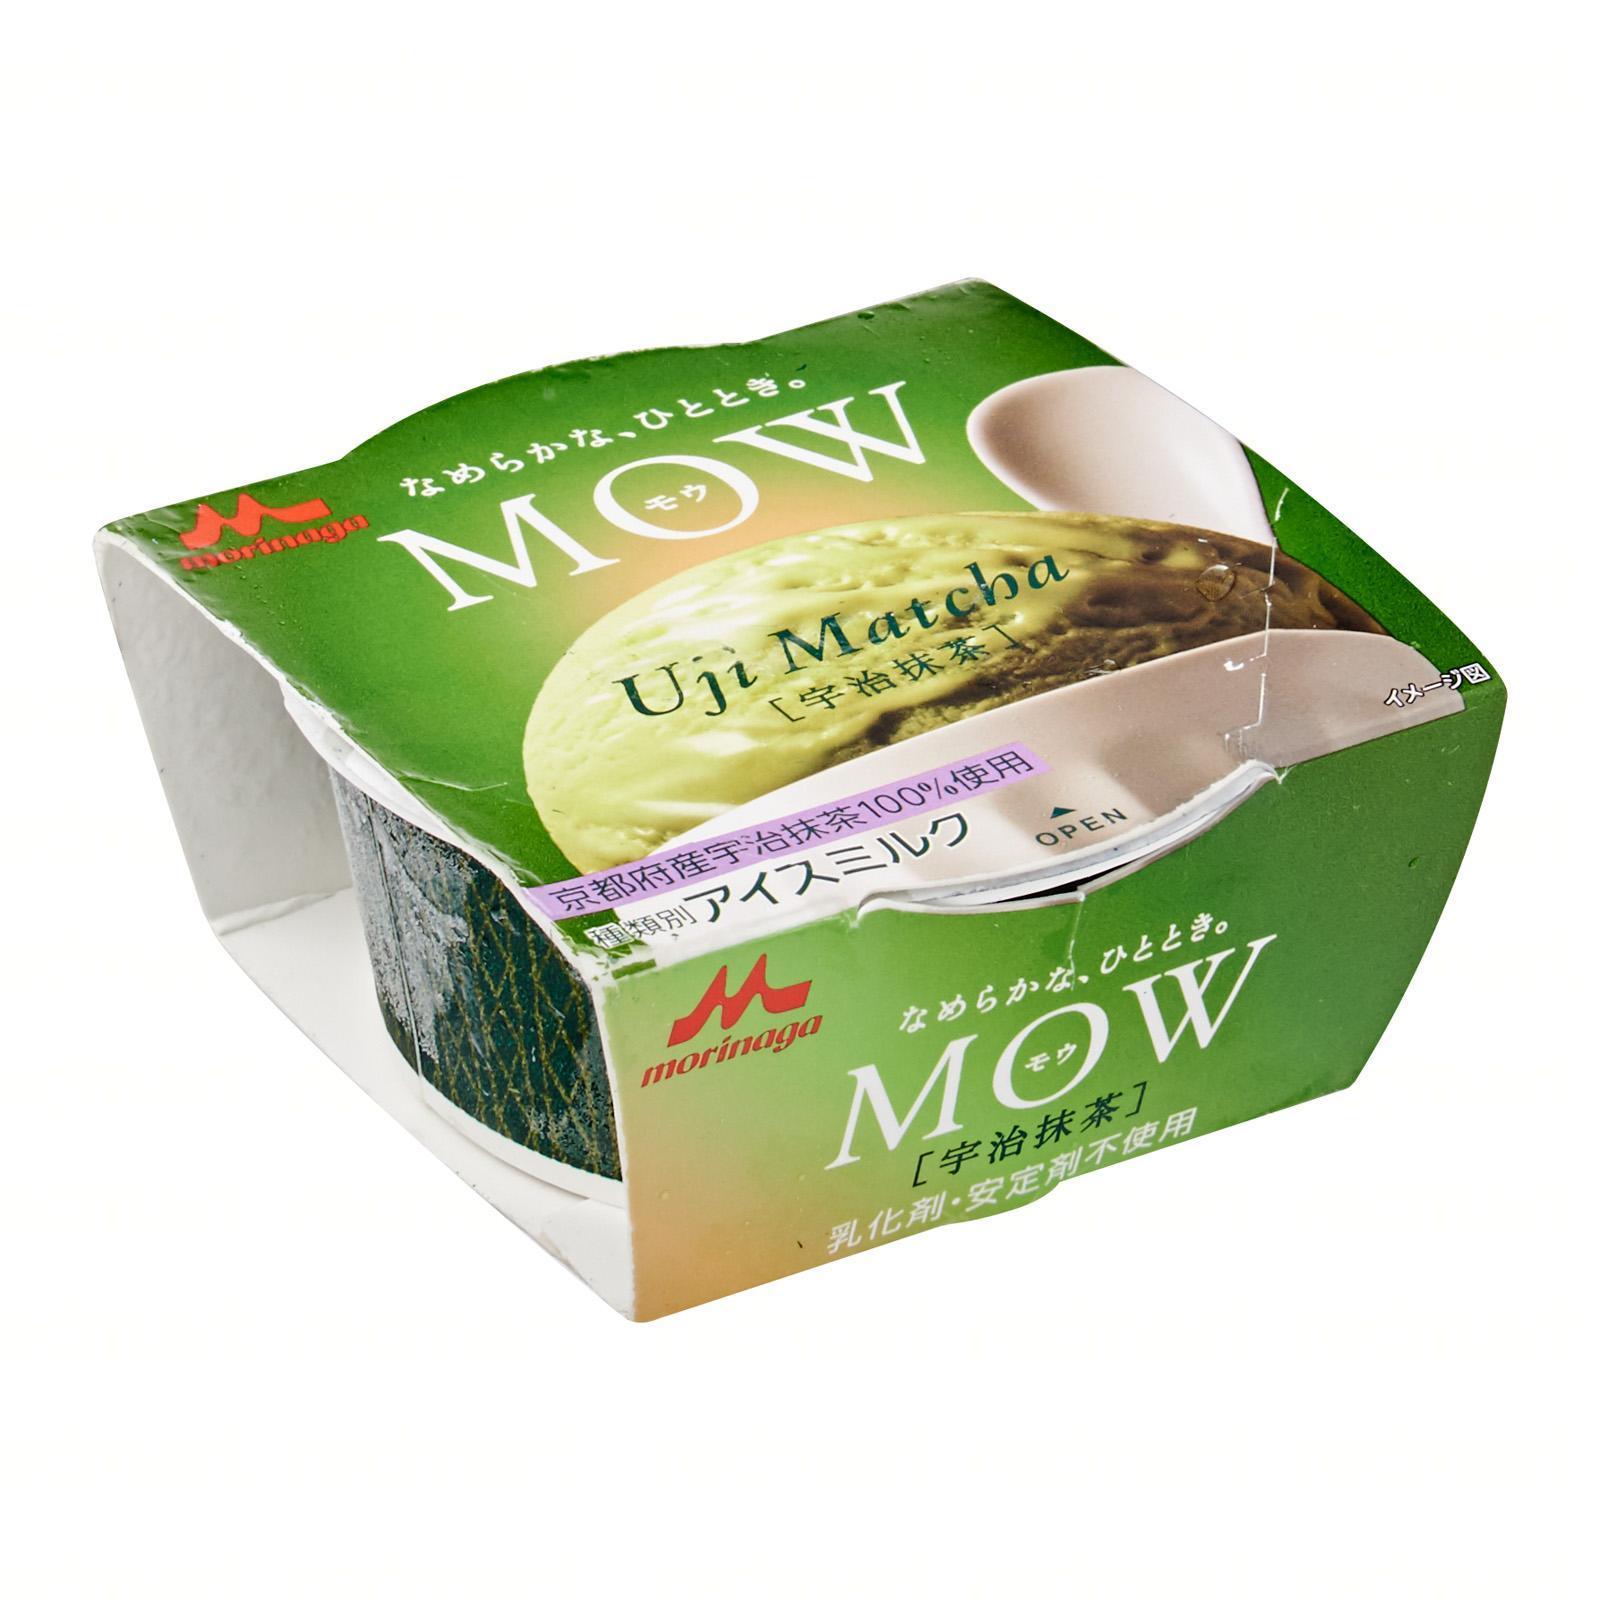 Morinaga Mow Cup Uji Matcha Green Tea Ice Cream - Frozen - Jetro Special